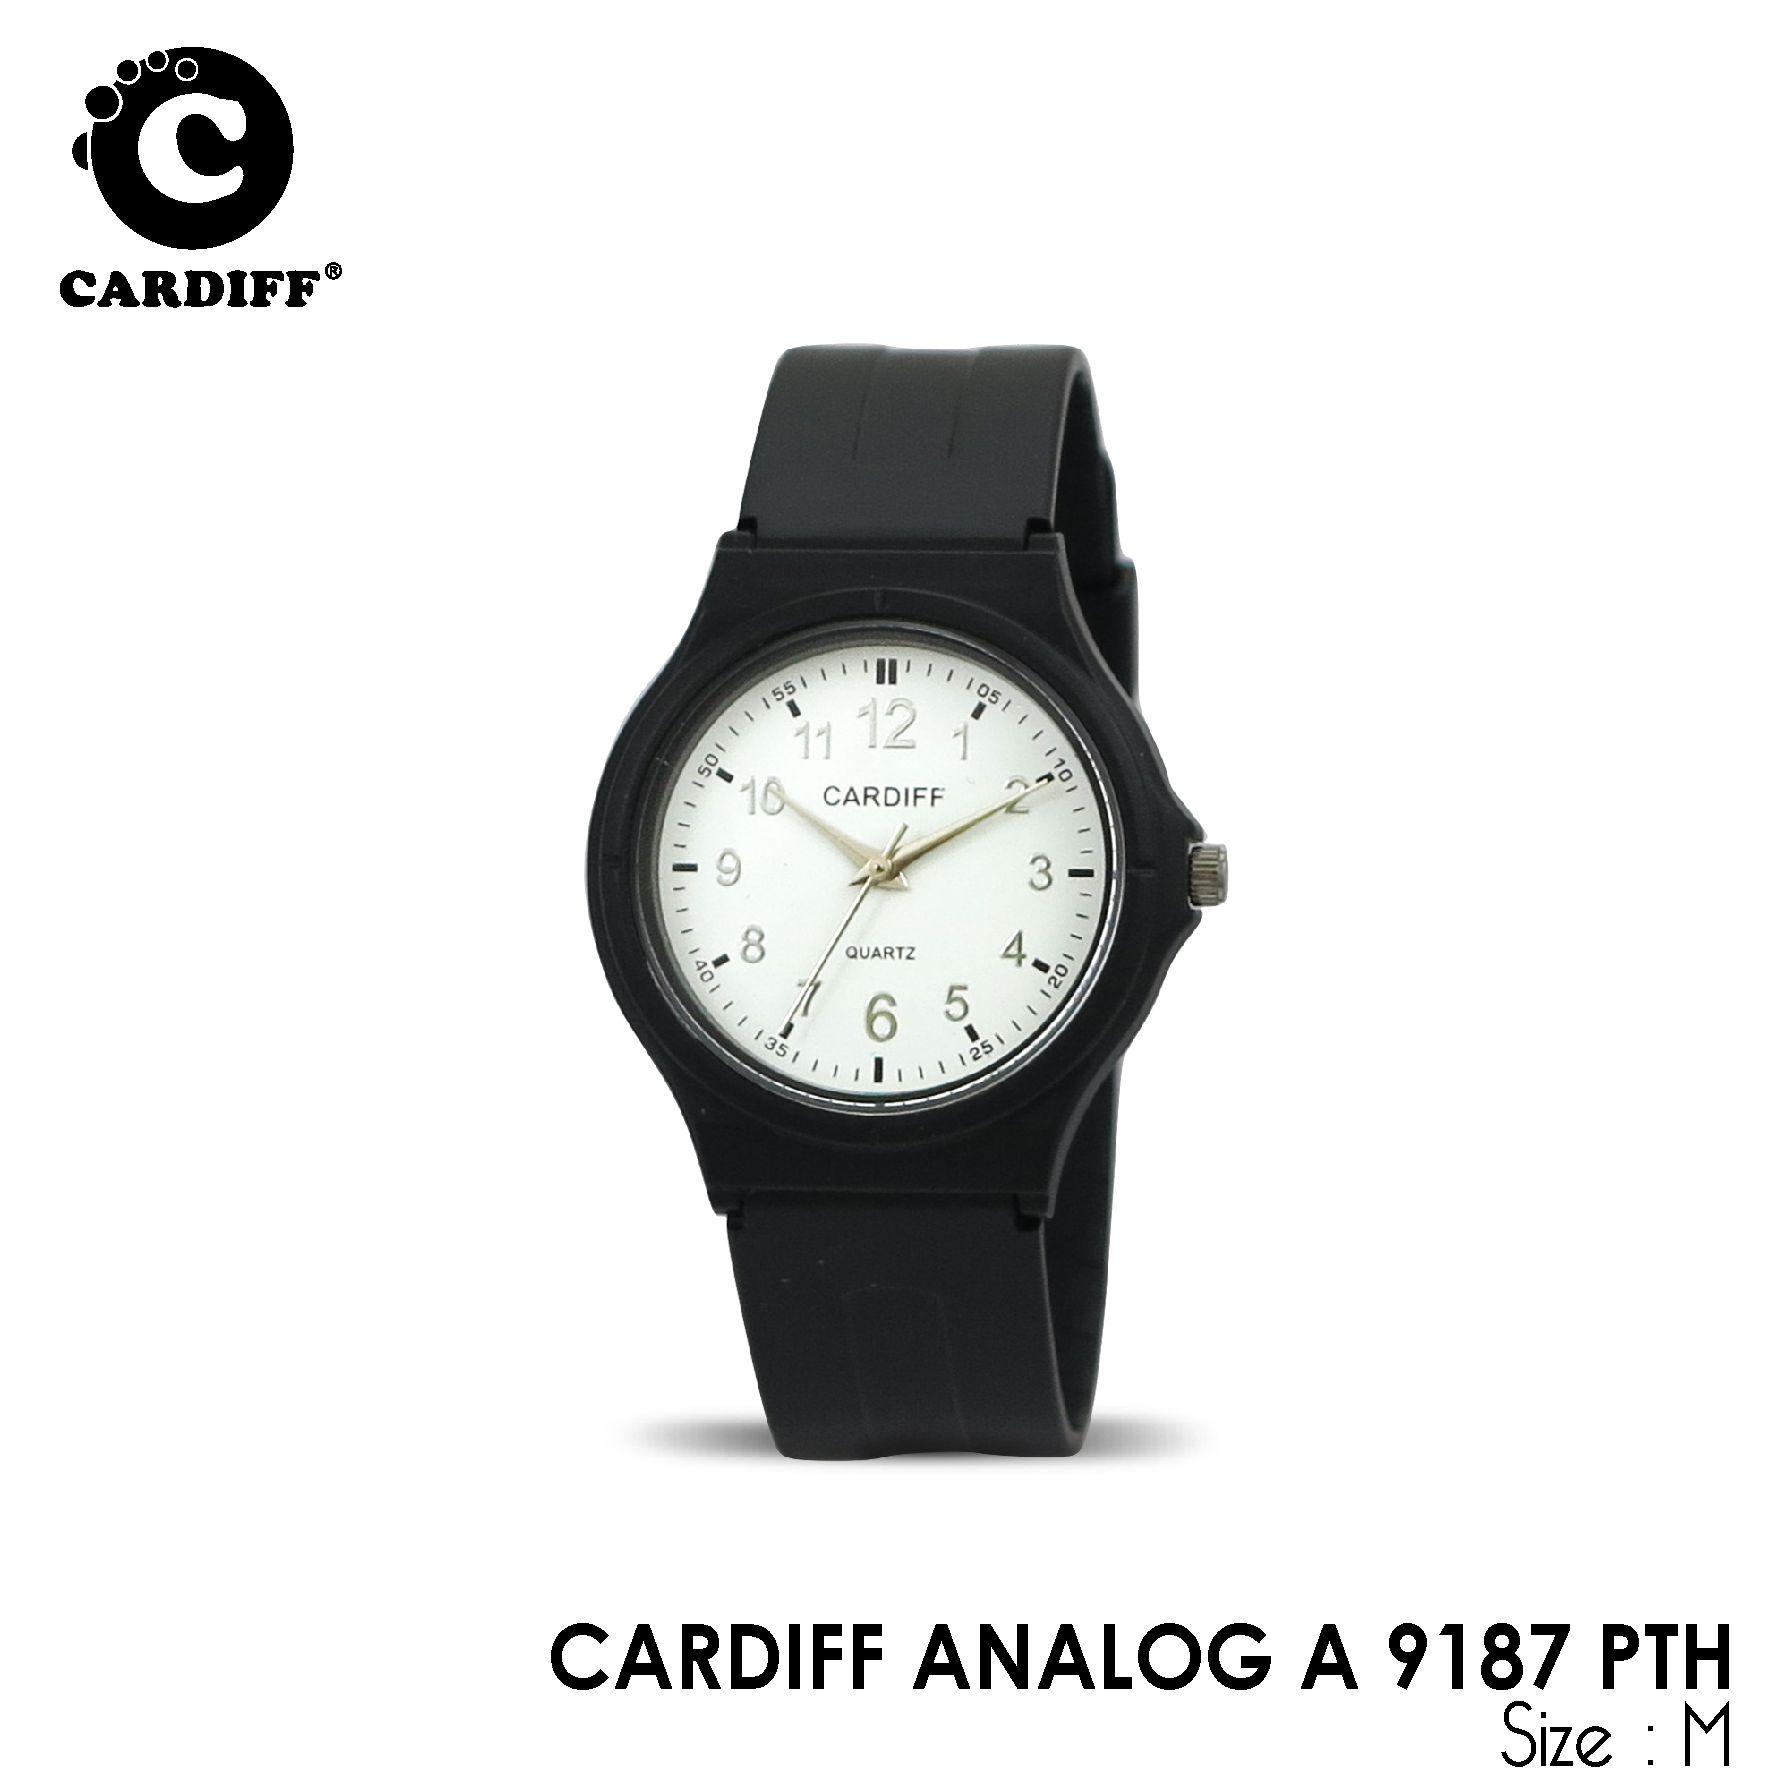 Cardiff Analog A 9187